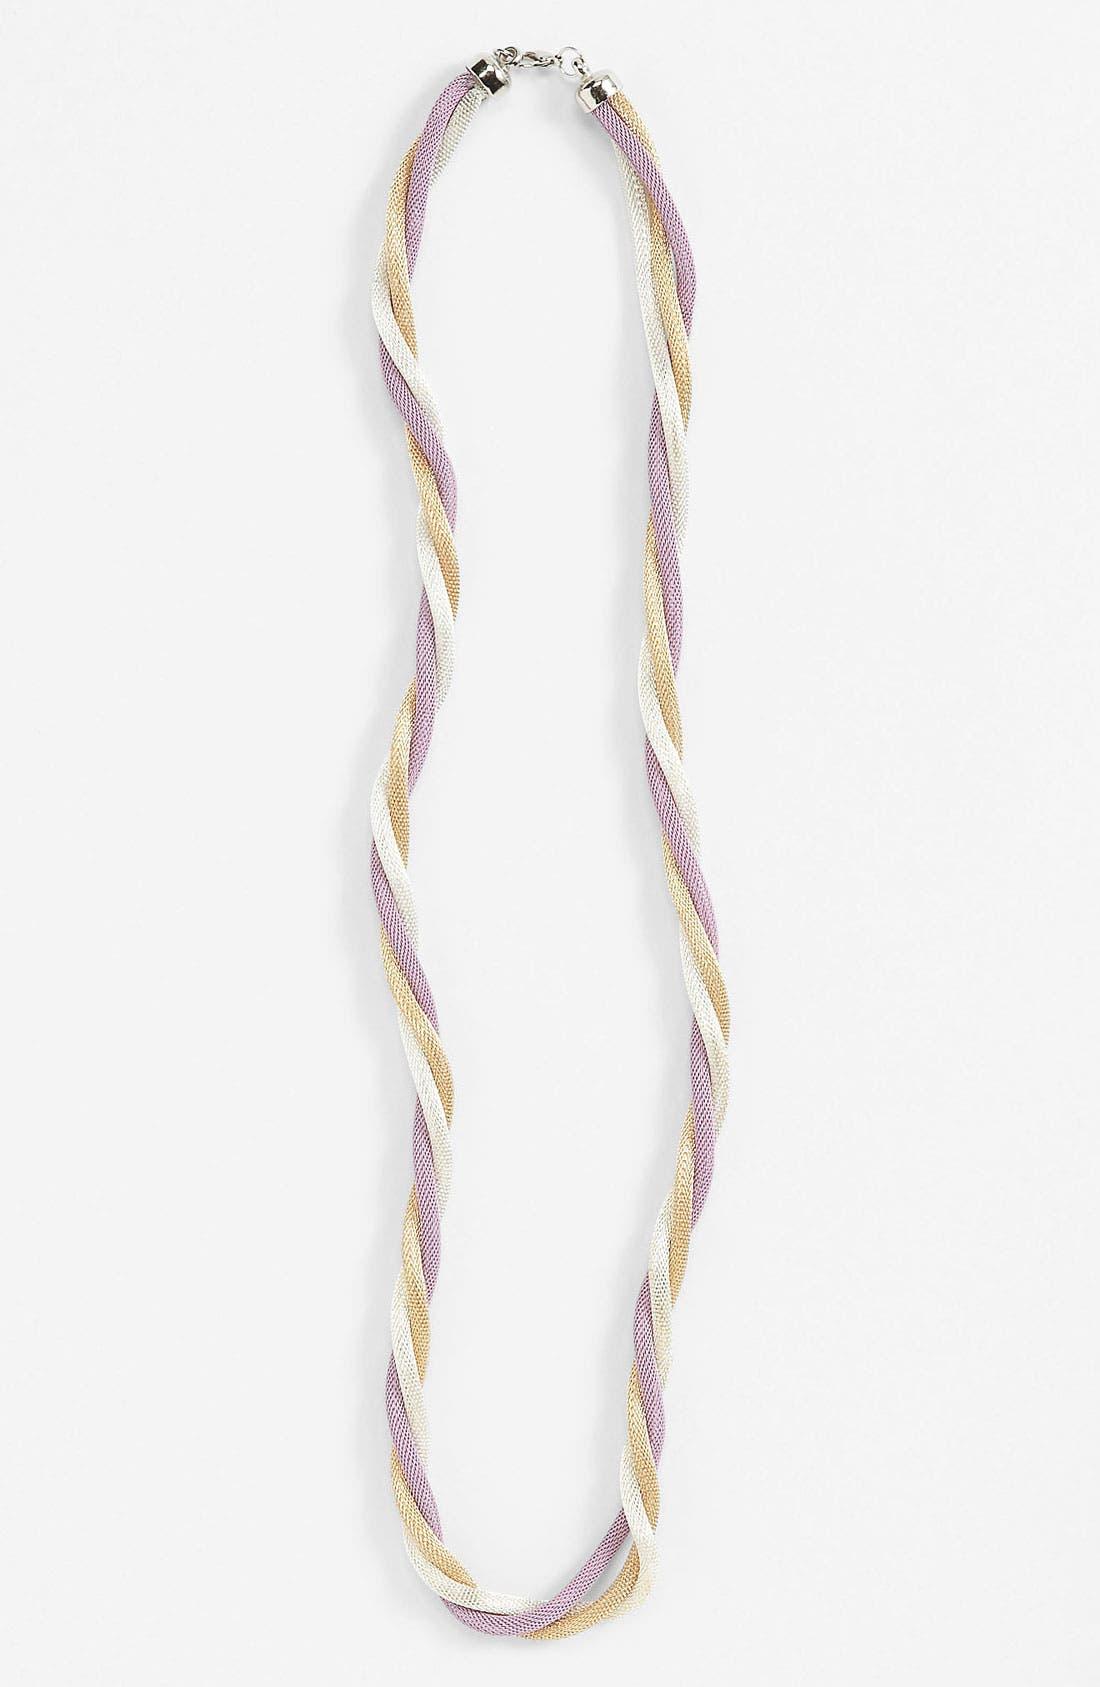 Main Image - Natasha Couture 'Twisted Snake Chain' Necklace